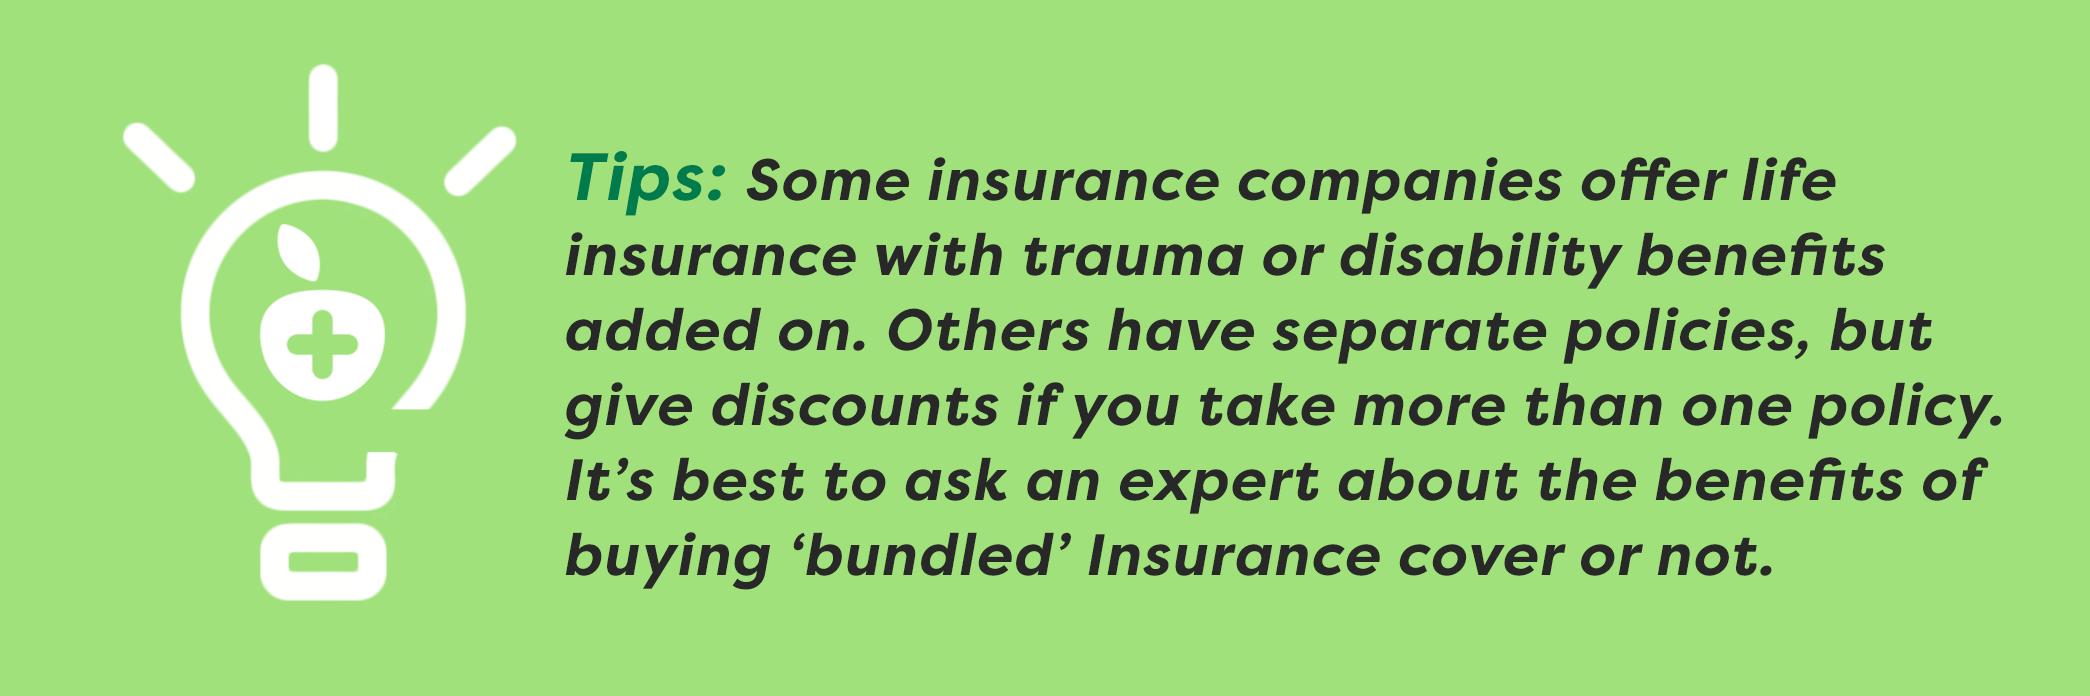 life insurance tip 1